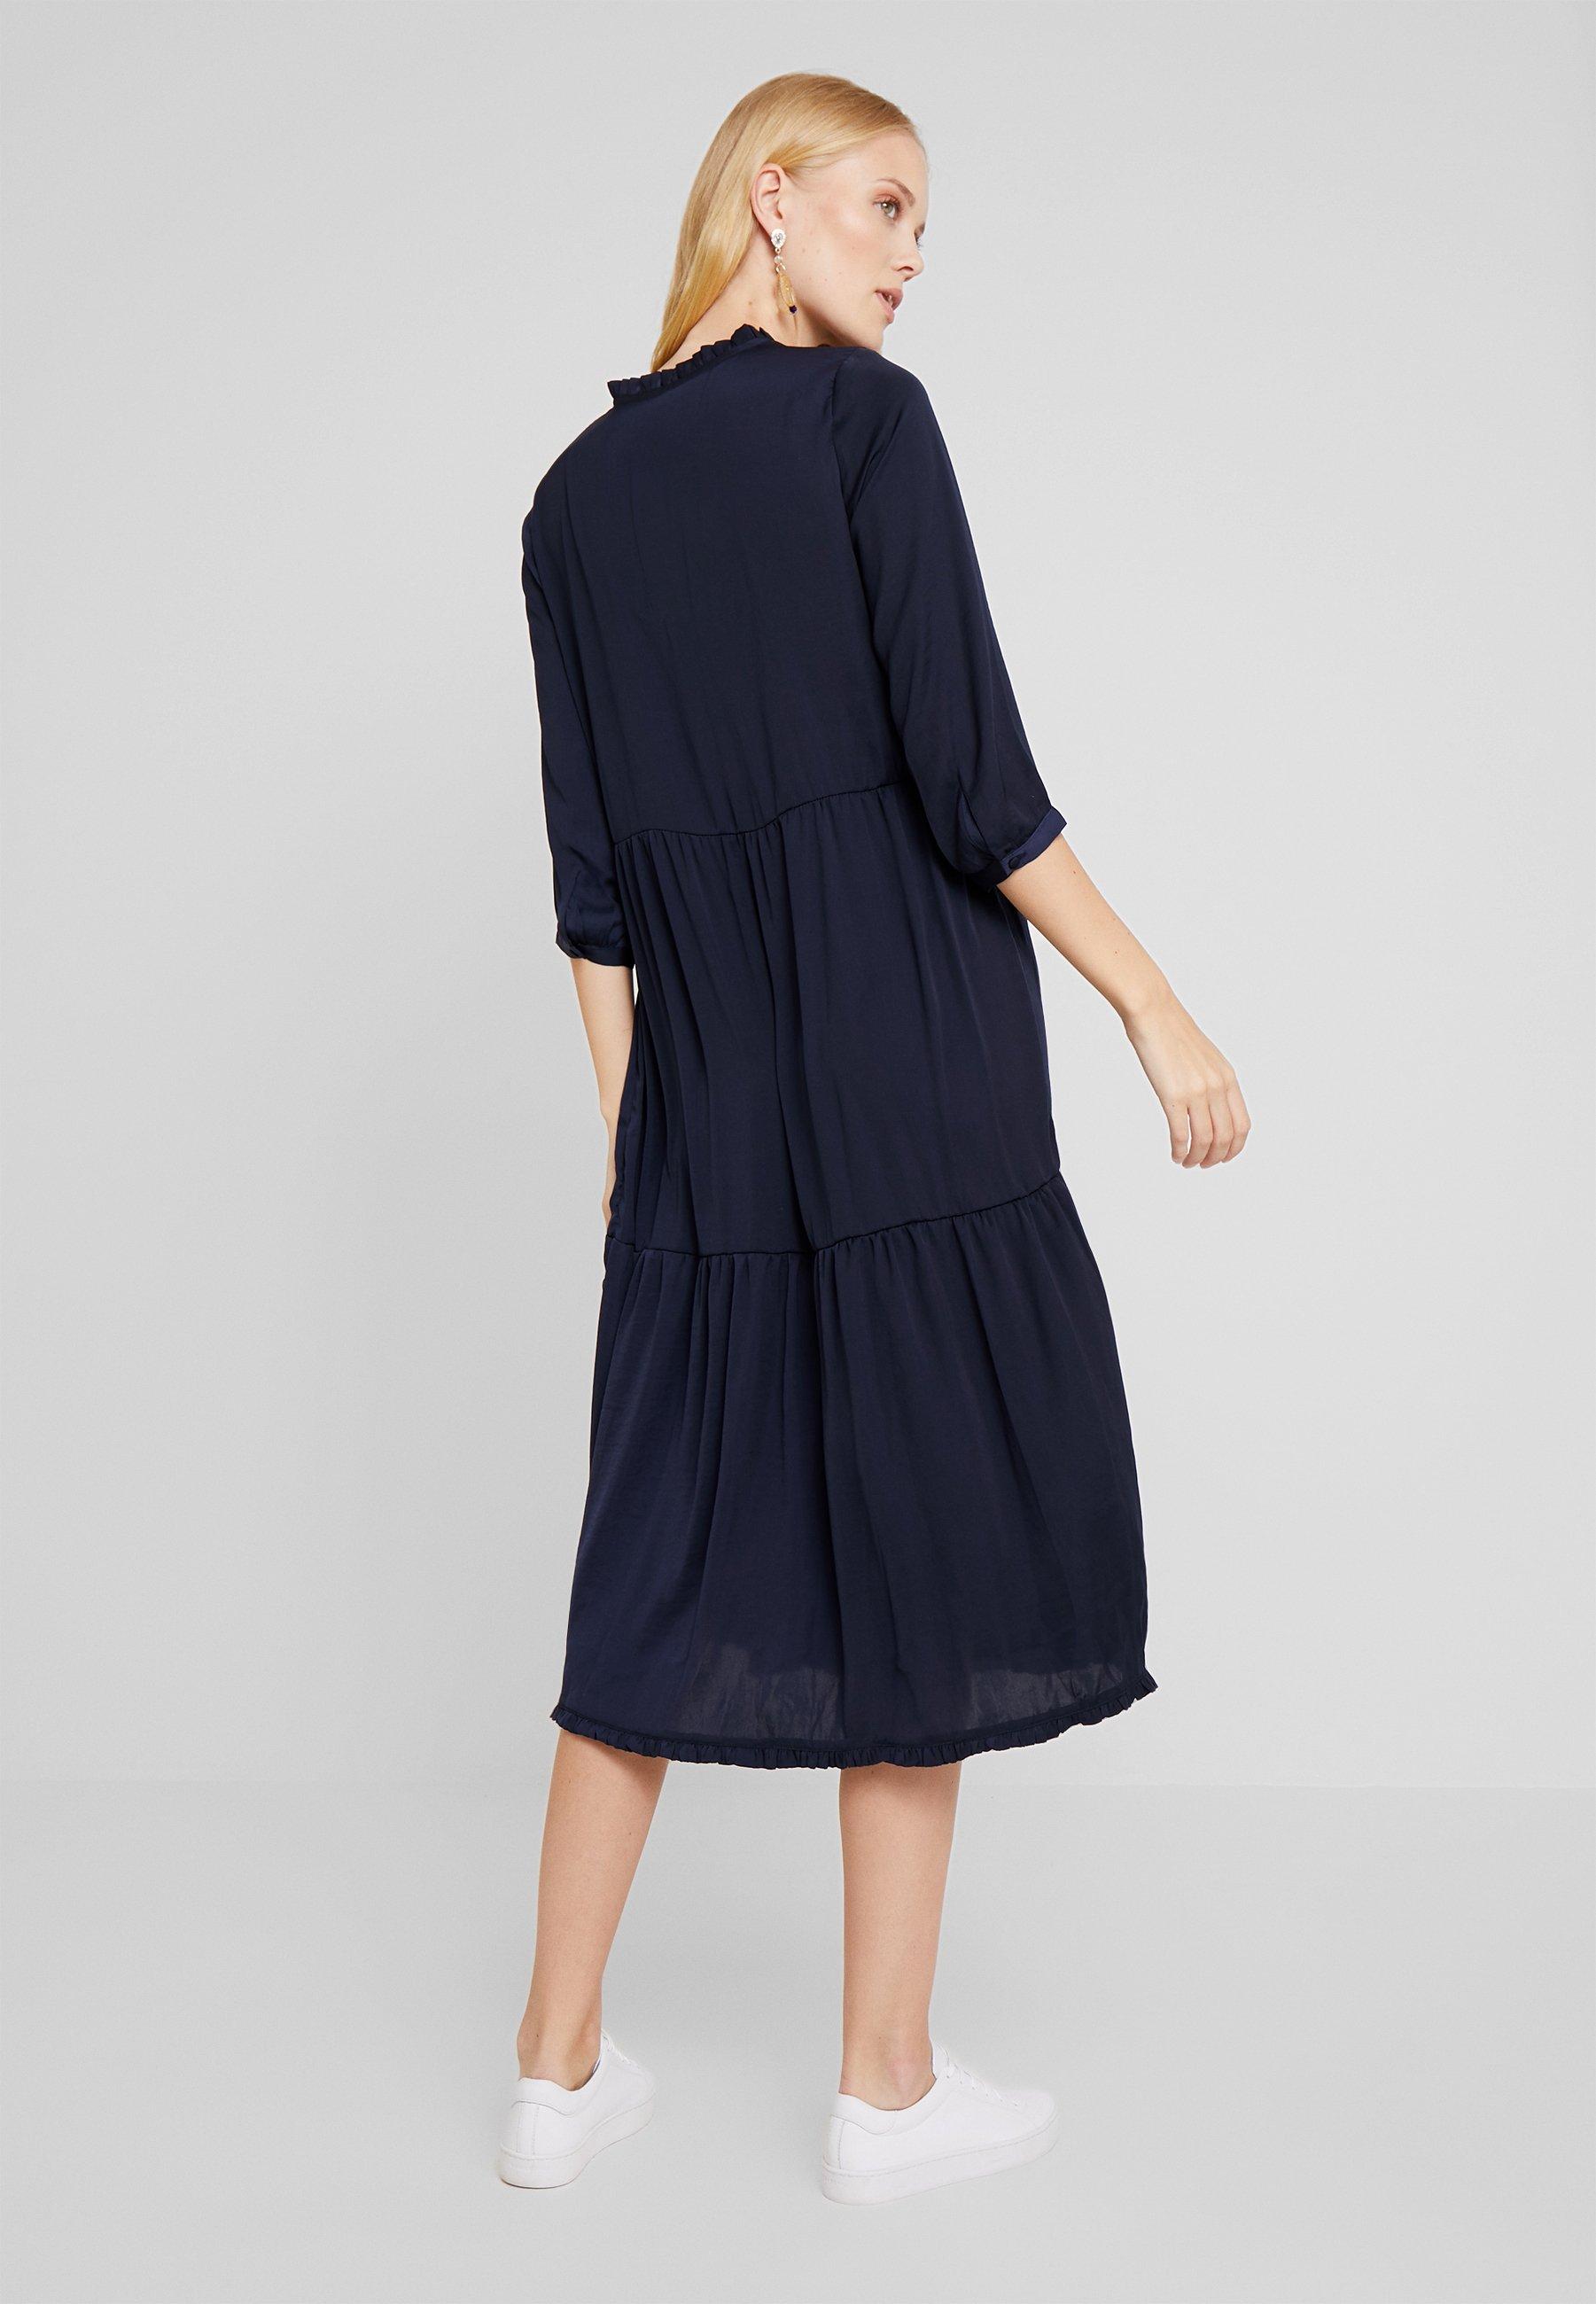 PEPPERCORN Robe d'été - bleu marine navy